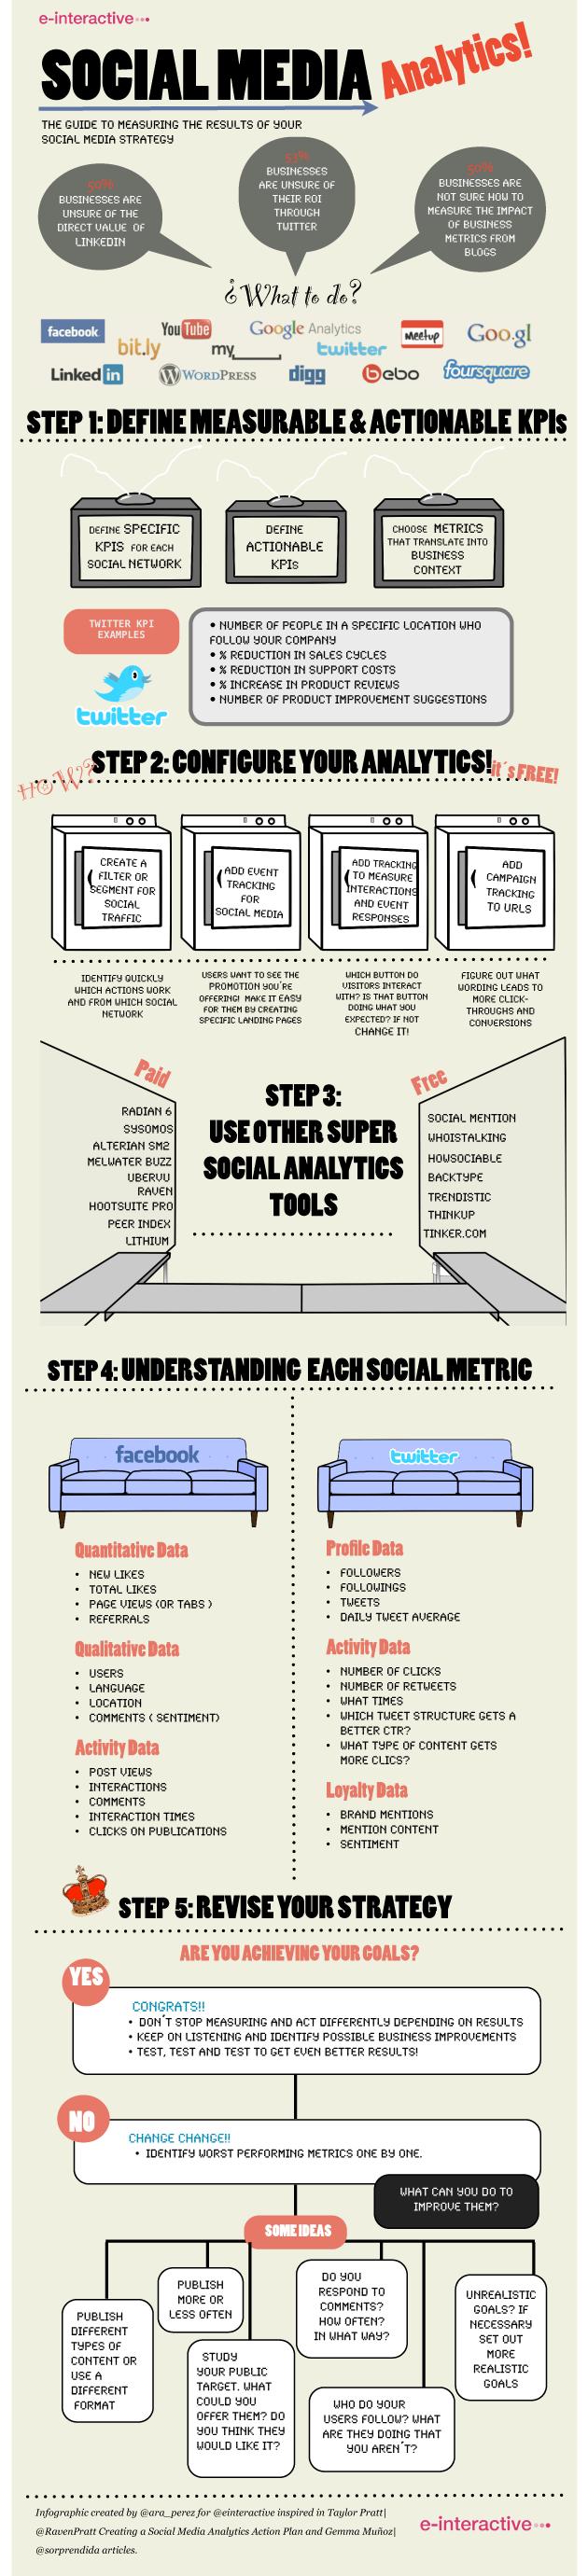 Social-Media-Analytics-Infographic1